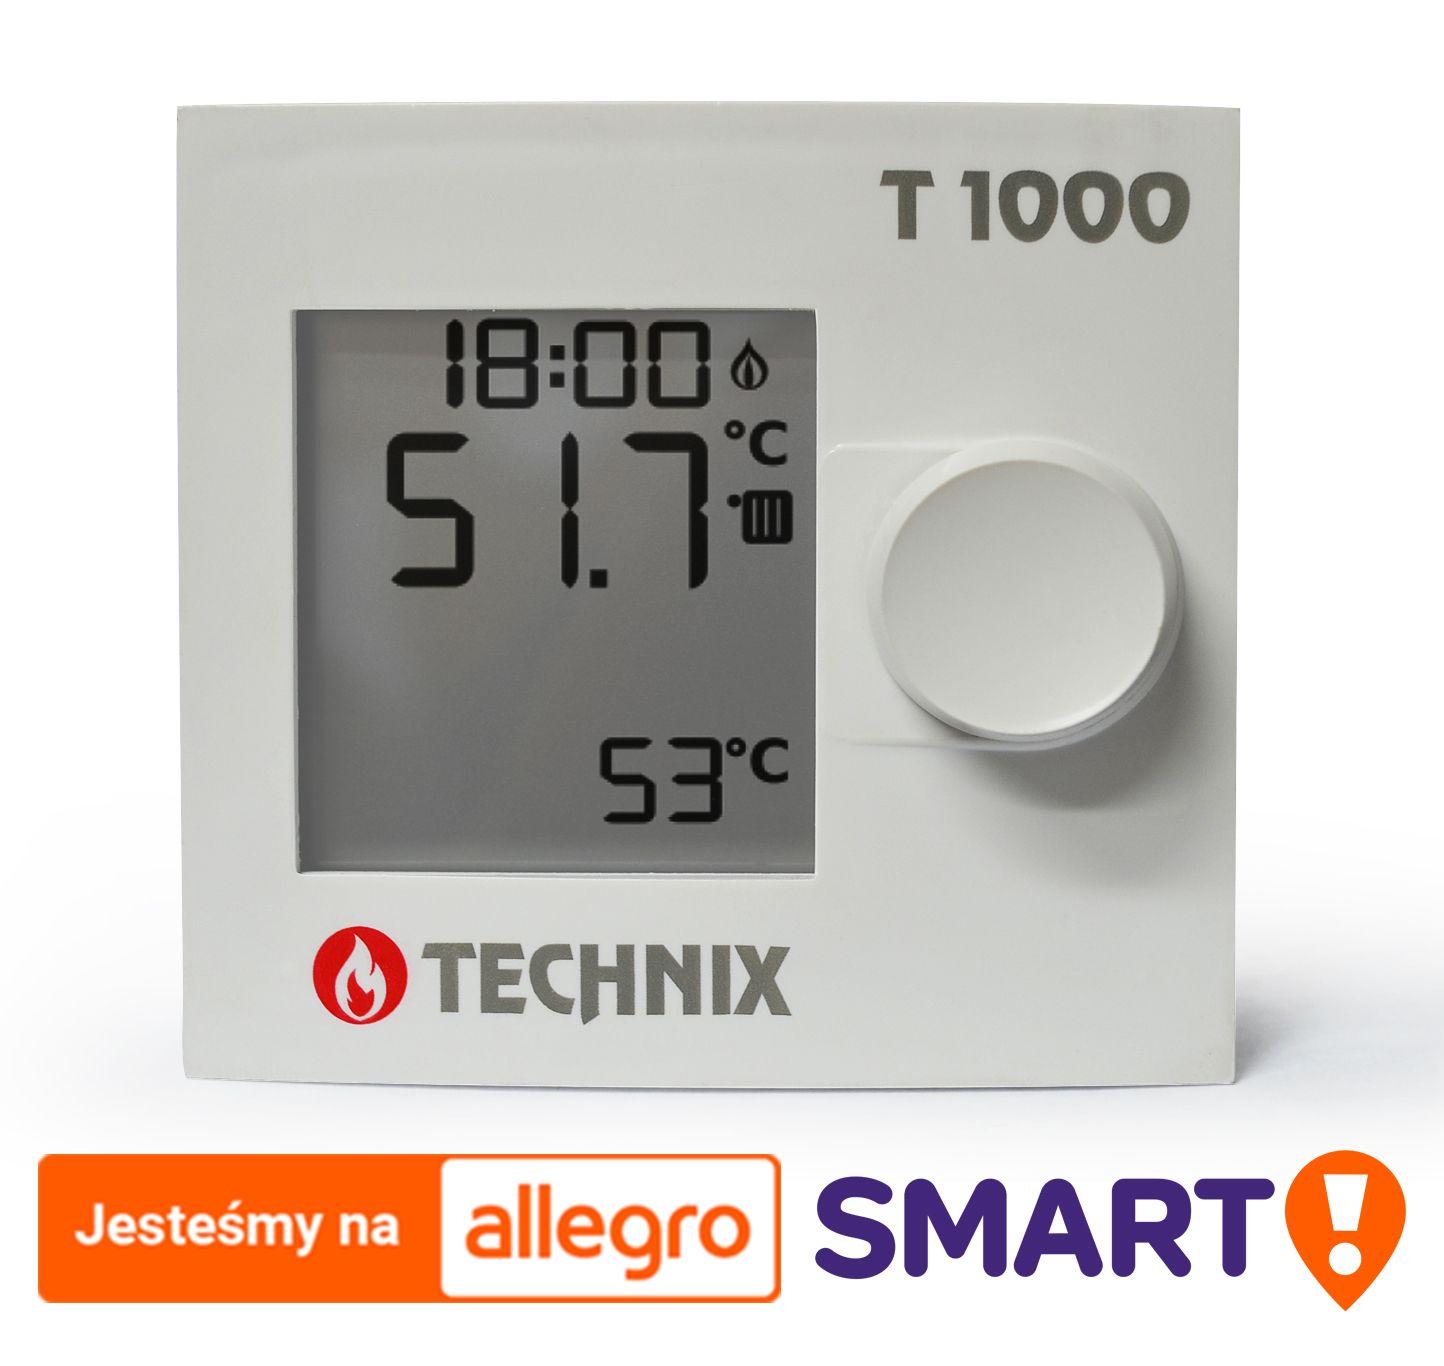 Termostat Pokojowy T1000 Technix Do Talos Eos 7791561693 Oficjalne Archiwum Allegro Timer Digital Alarm Clock Alarm Clock